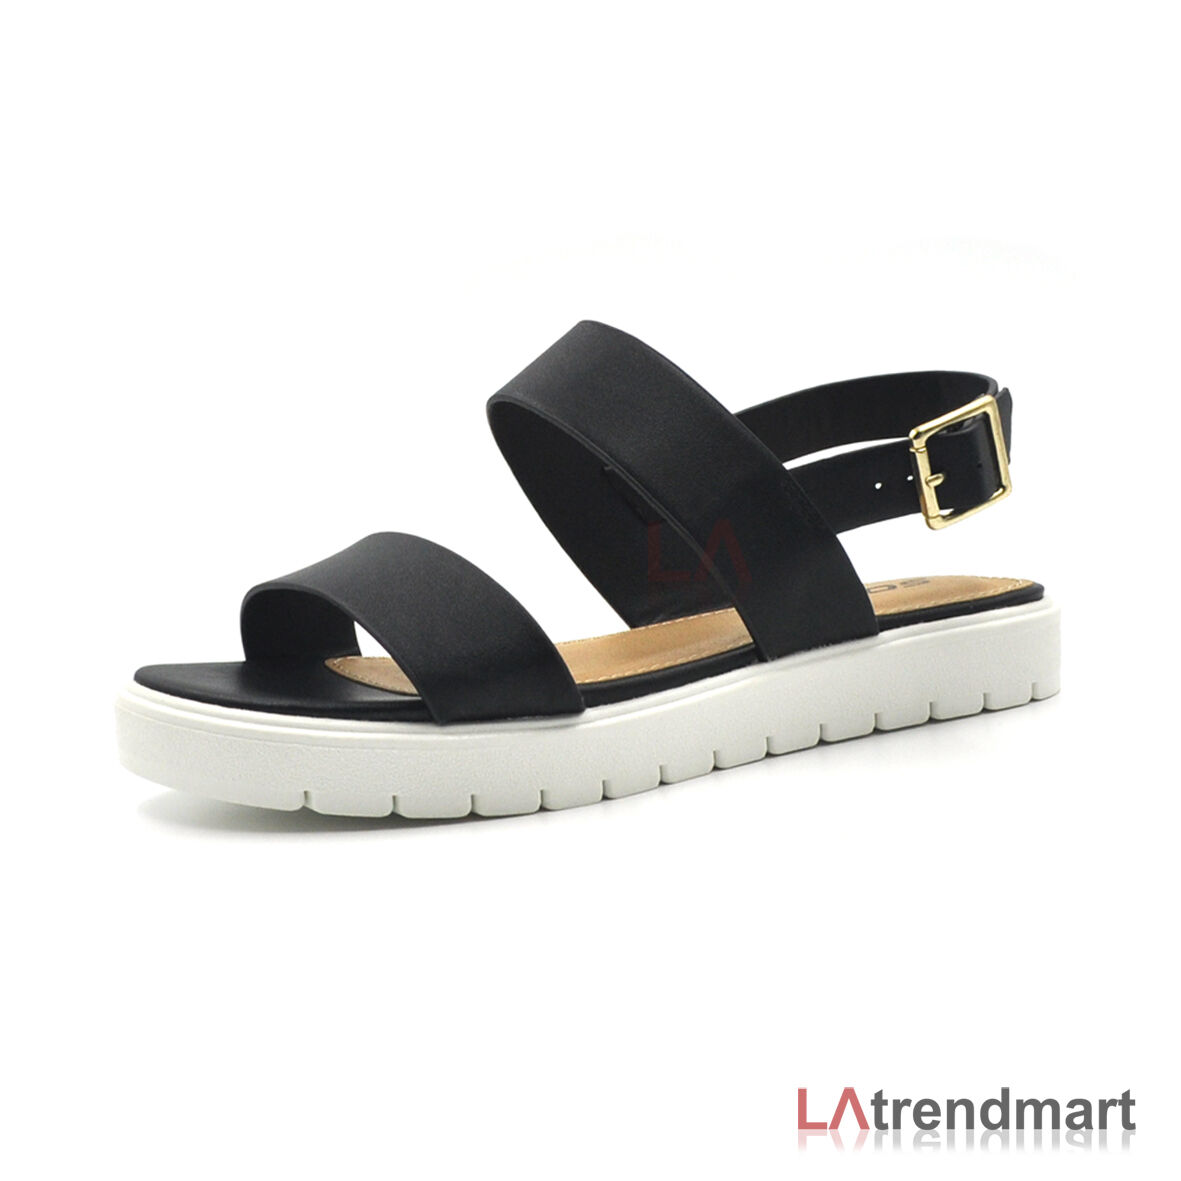 1fabf508e Hot Women Open Toe Sandals Slingback Flat Casual Ankle Buckle Strap SODA  Juniper Tan 8